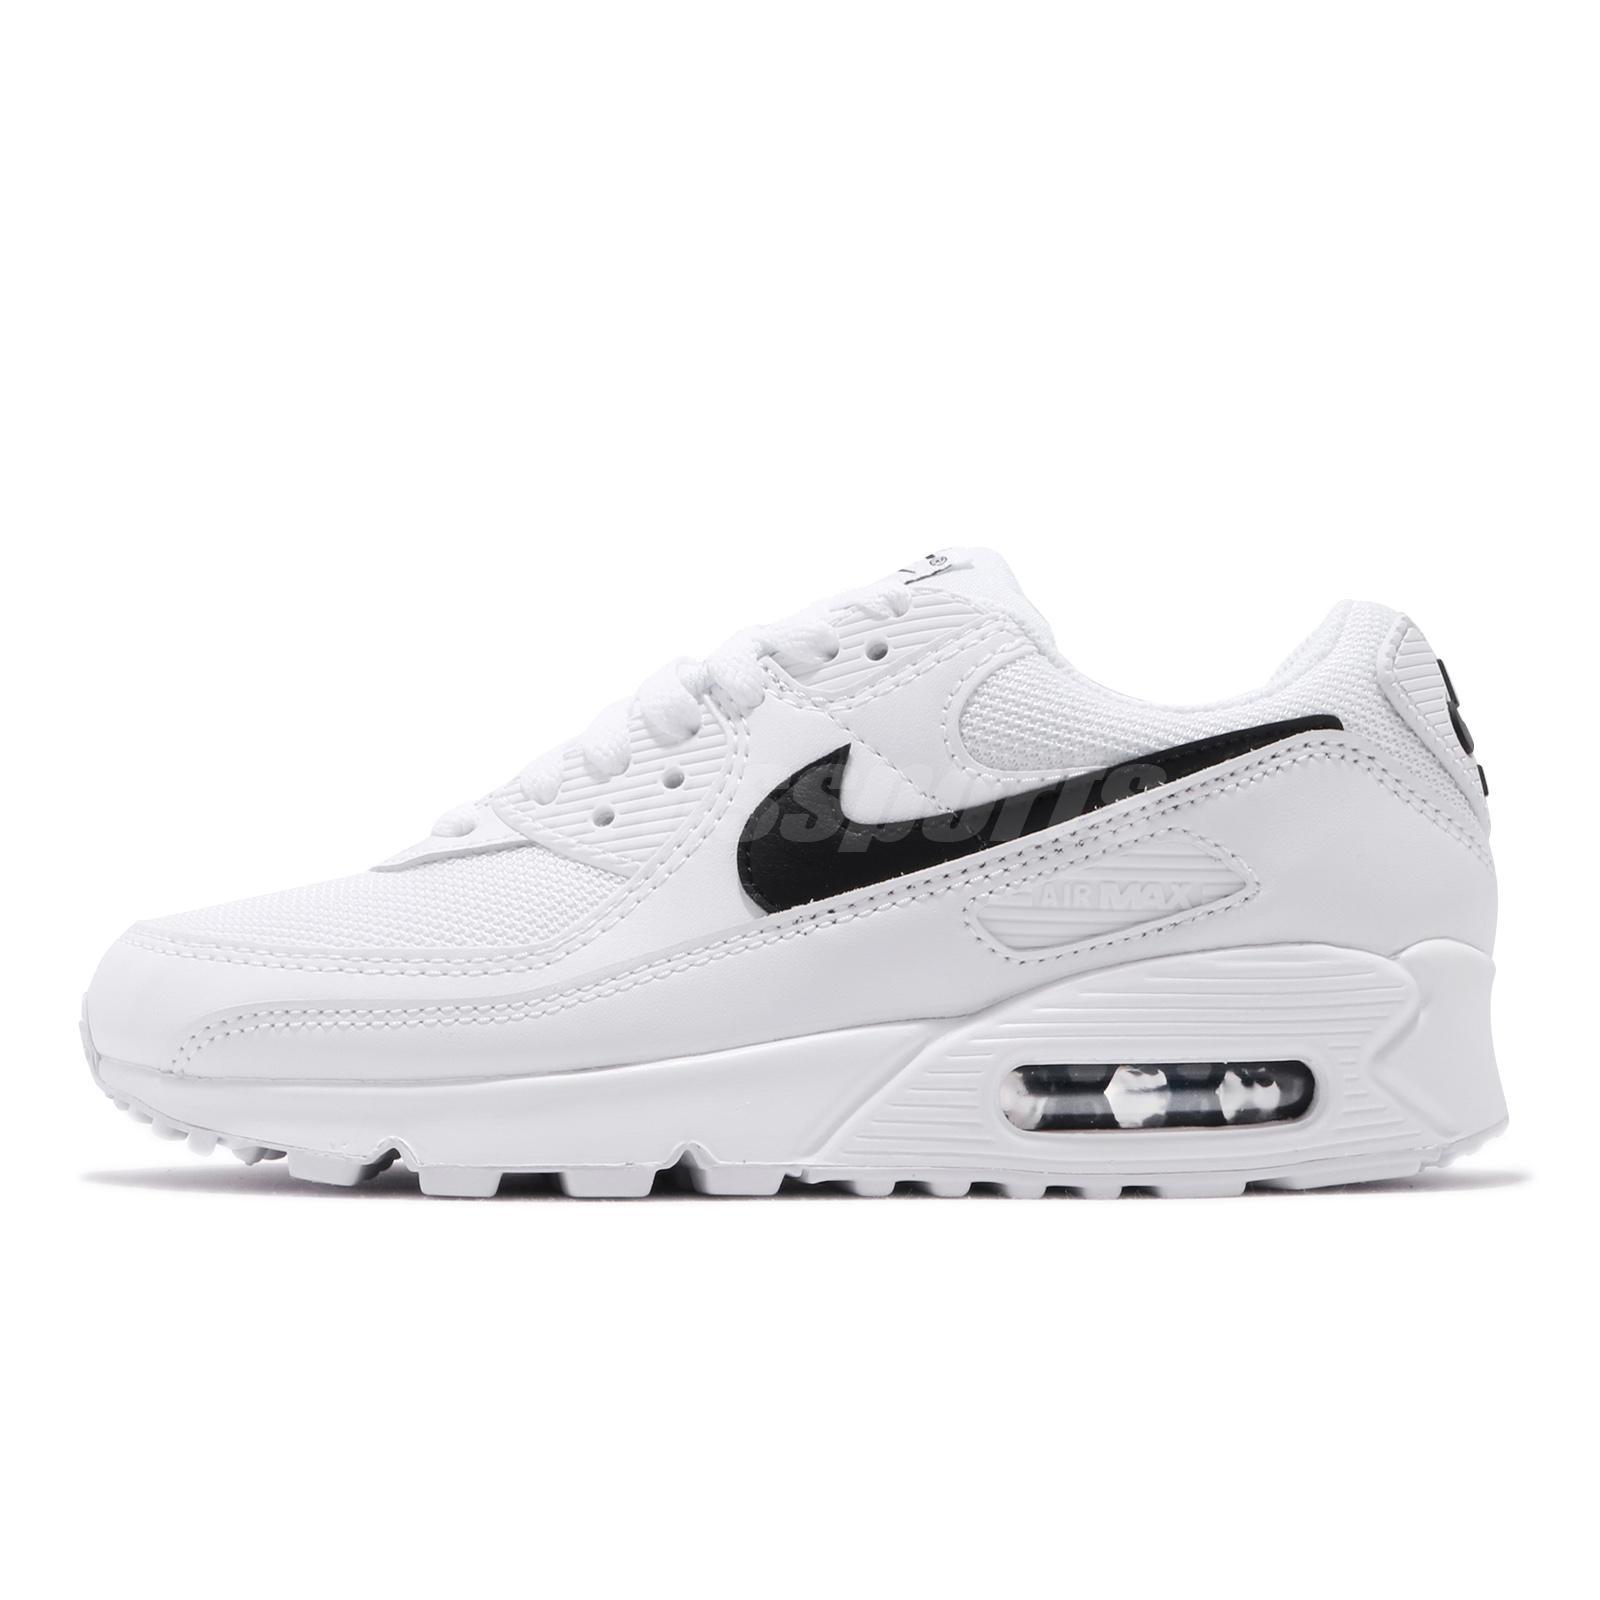 Nike Wmns Air Max 90 White Black Women Classic Casual Shoes Sneakers Cq2560 101 Ebay